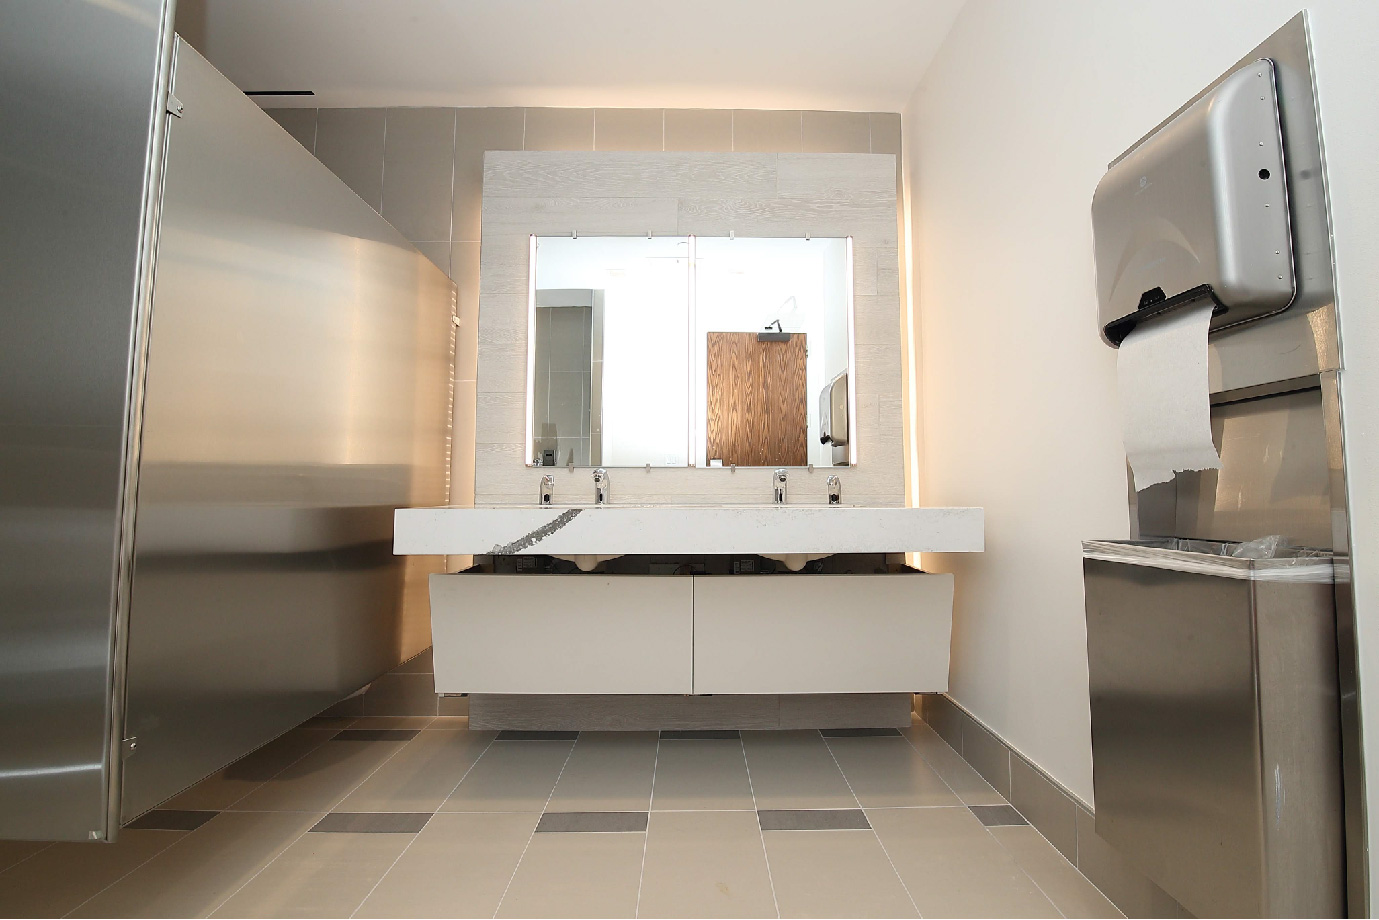 greenway-plaza-restroom5.jpg